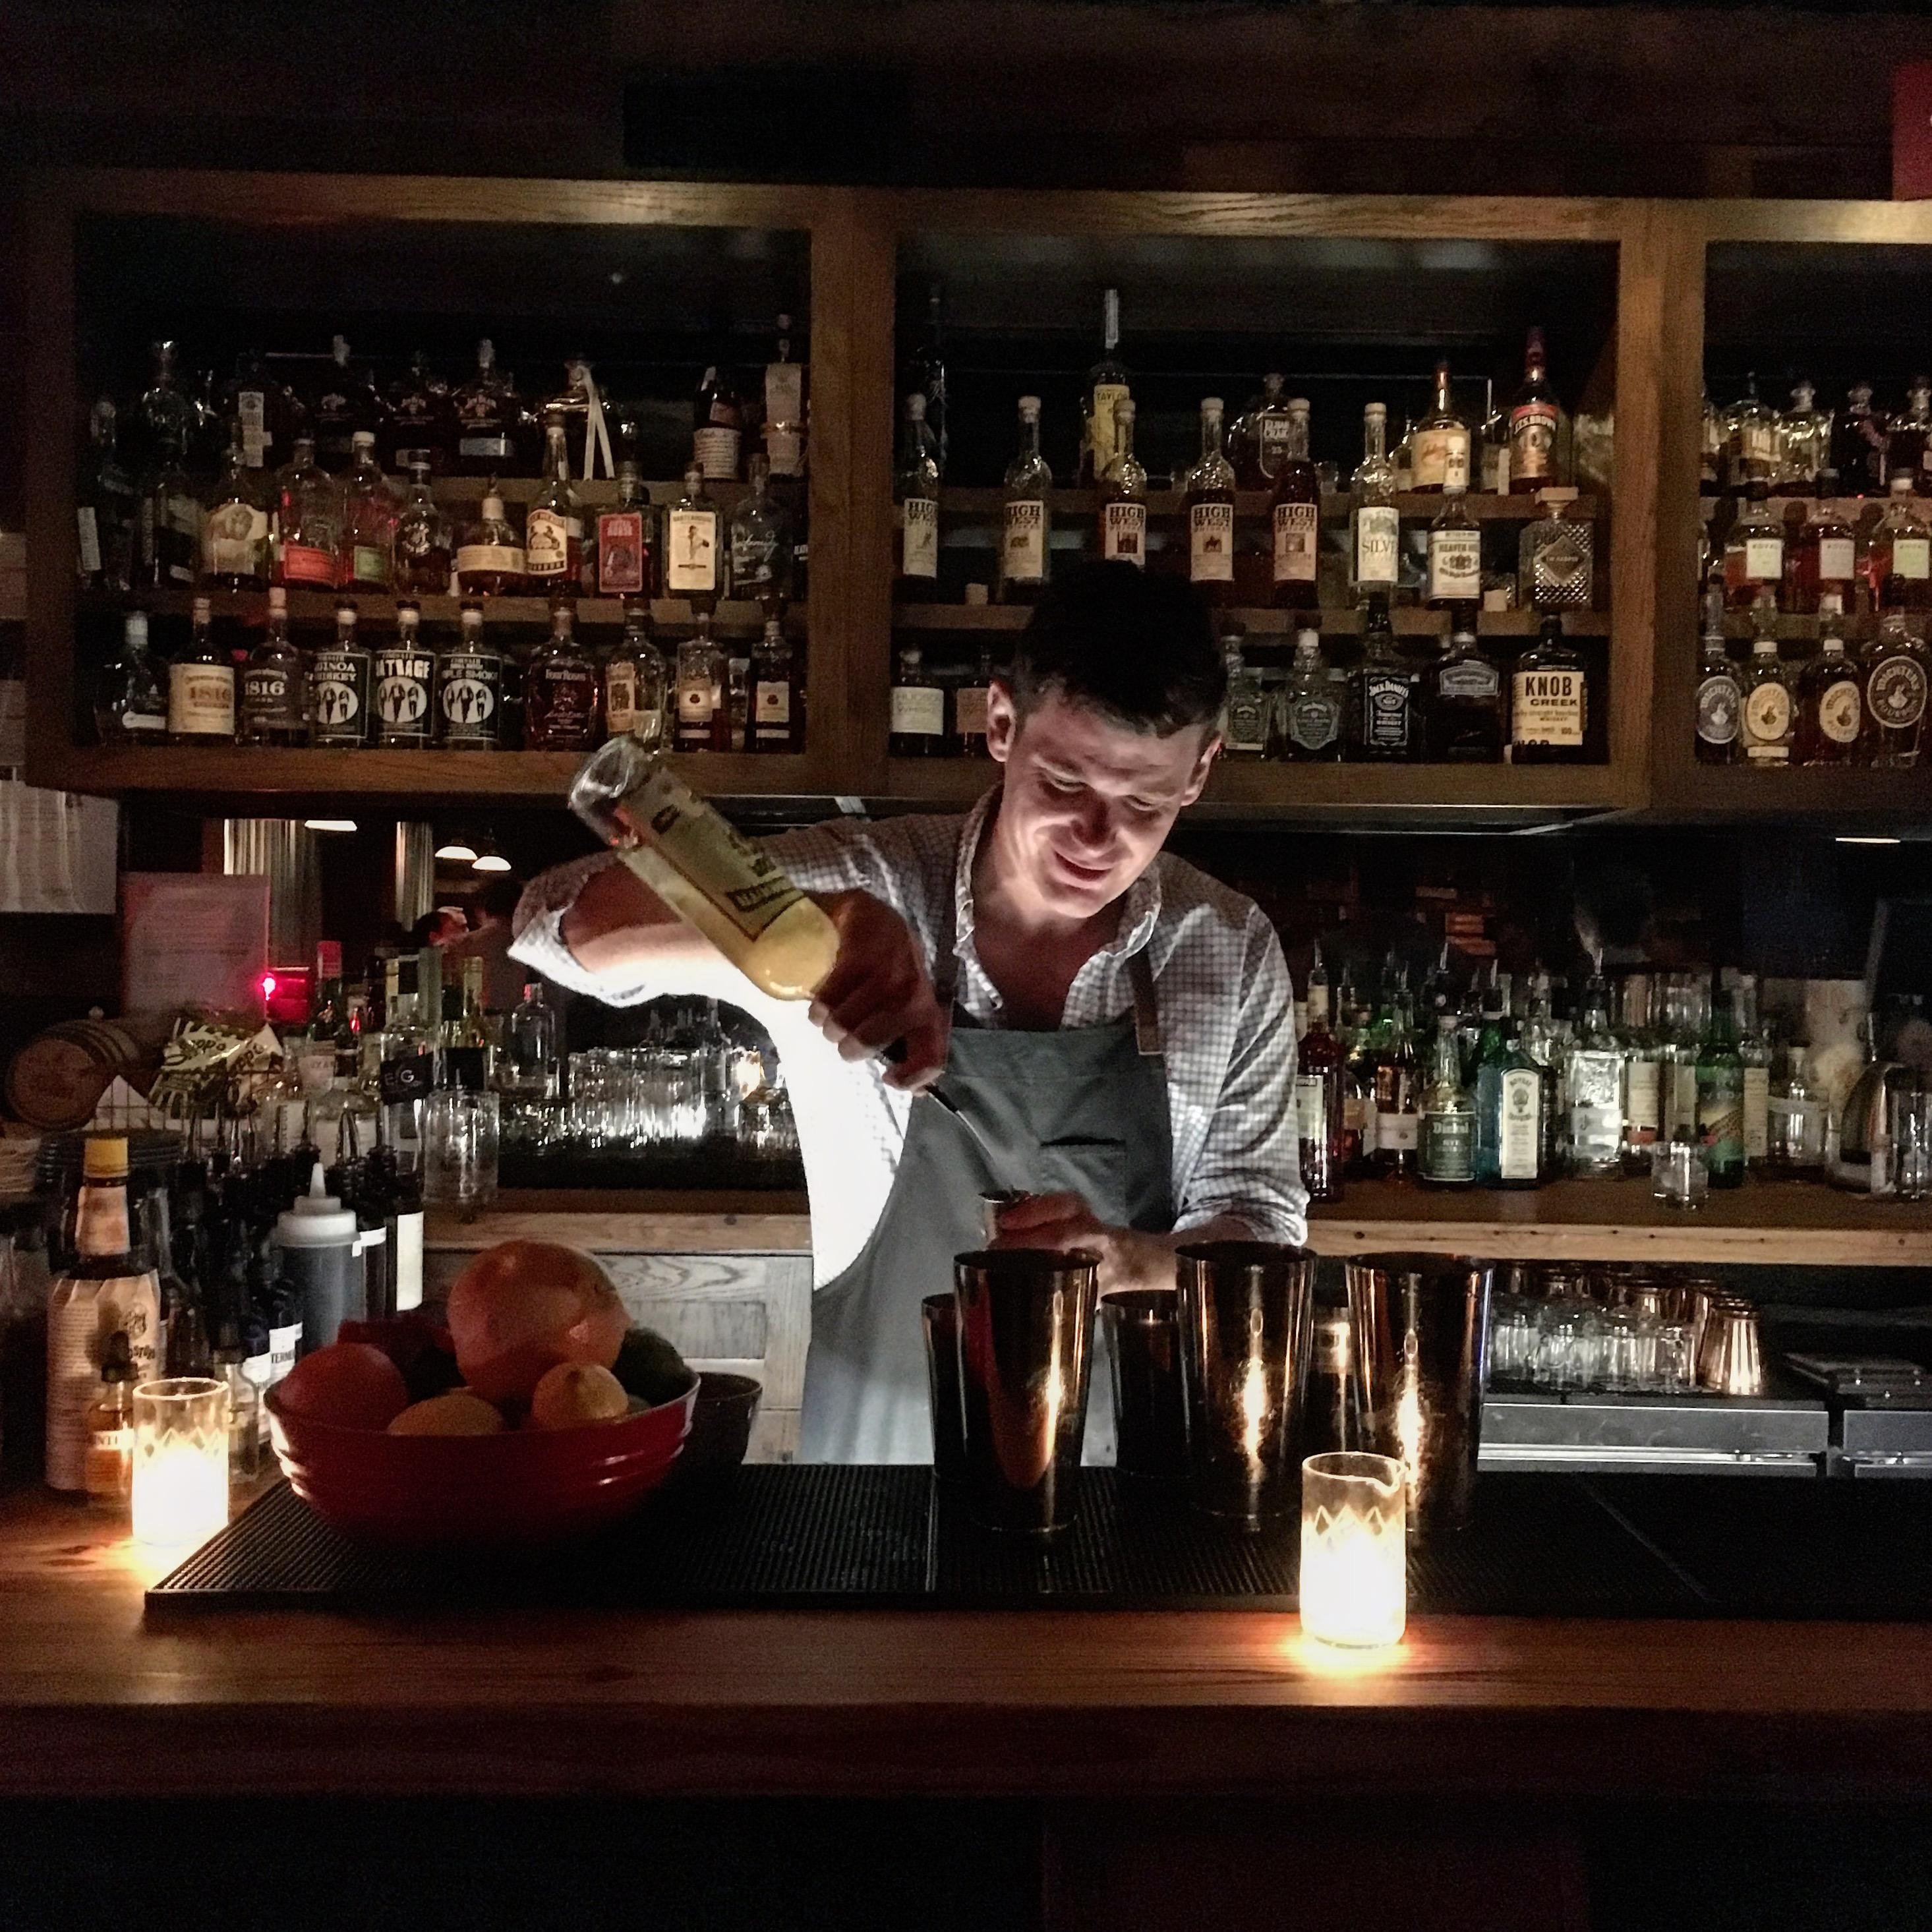 Teddy Nixon mixing up cocktails at Bar Mash.